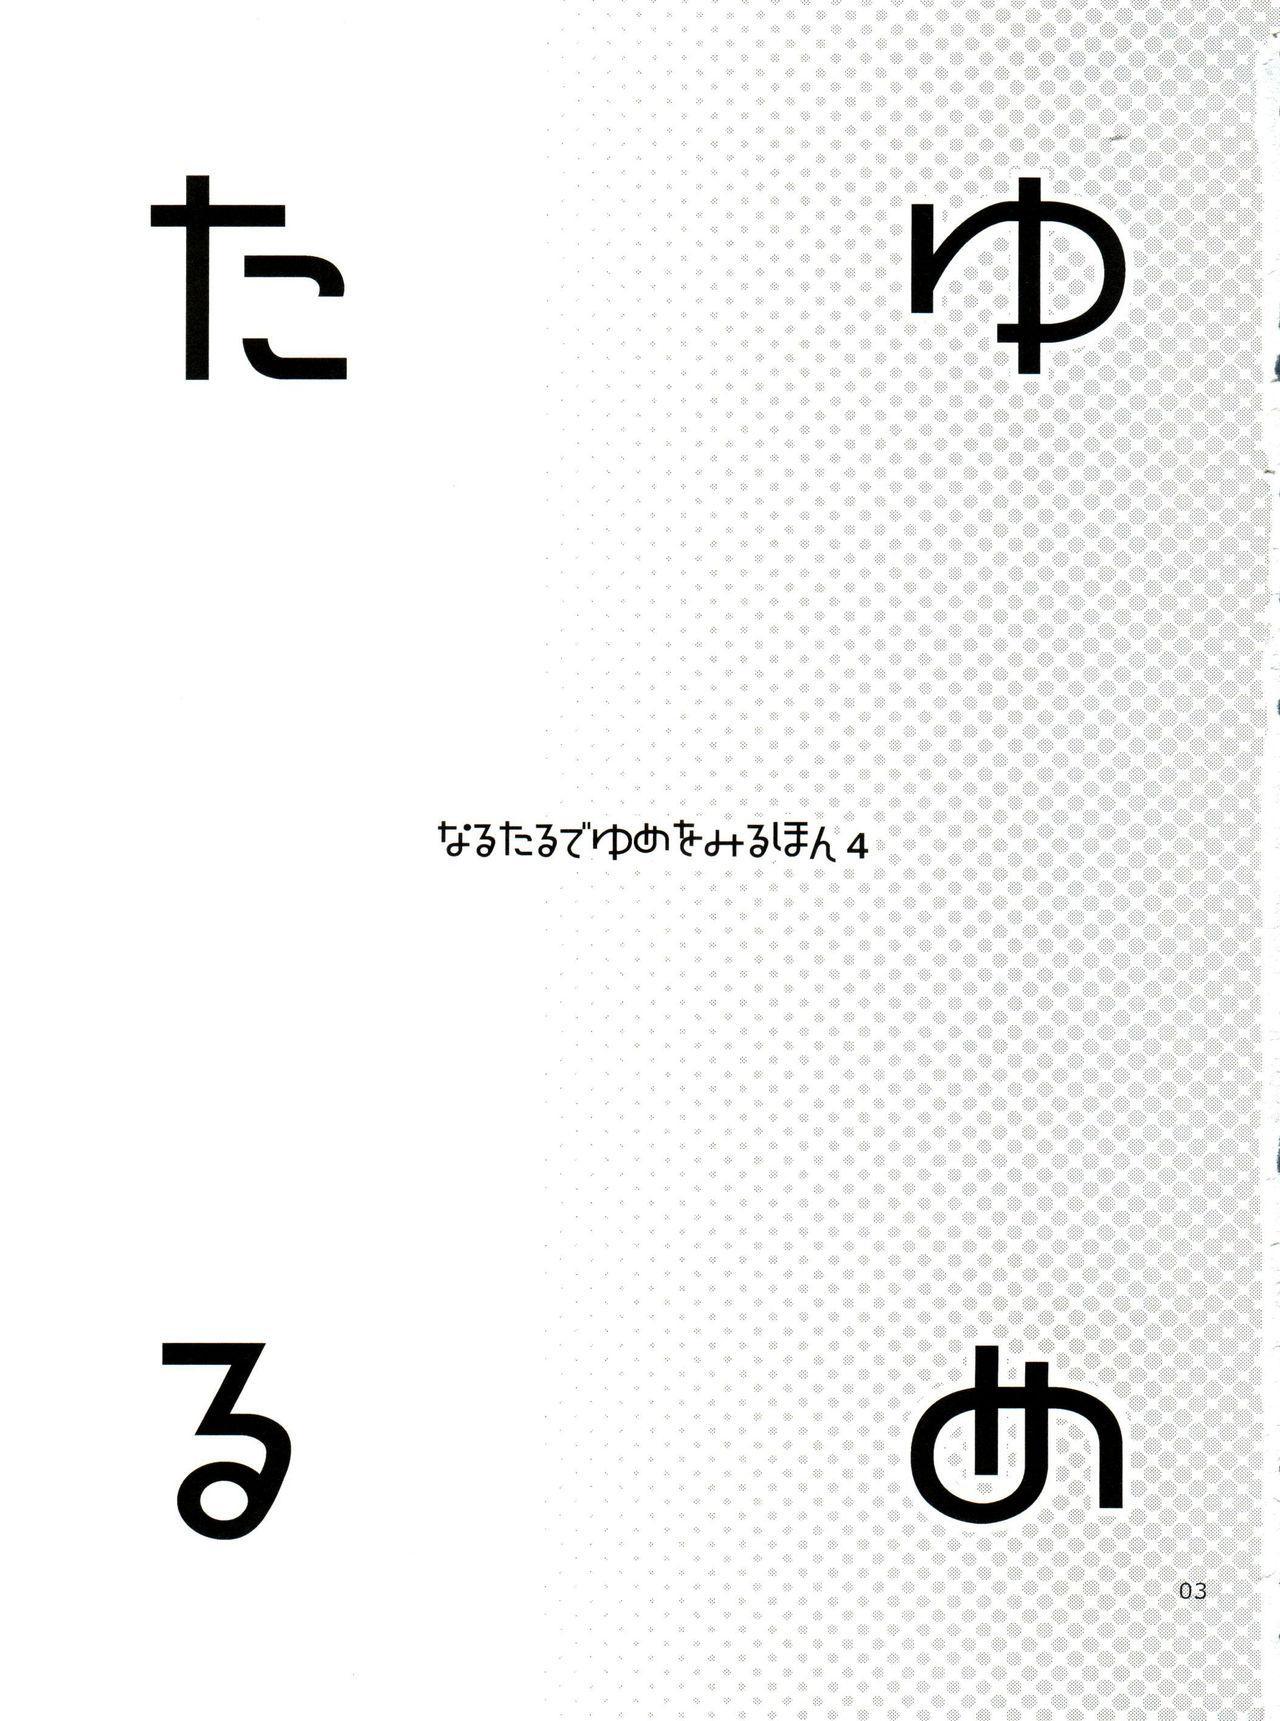 Taru Yume 4 2